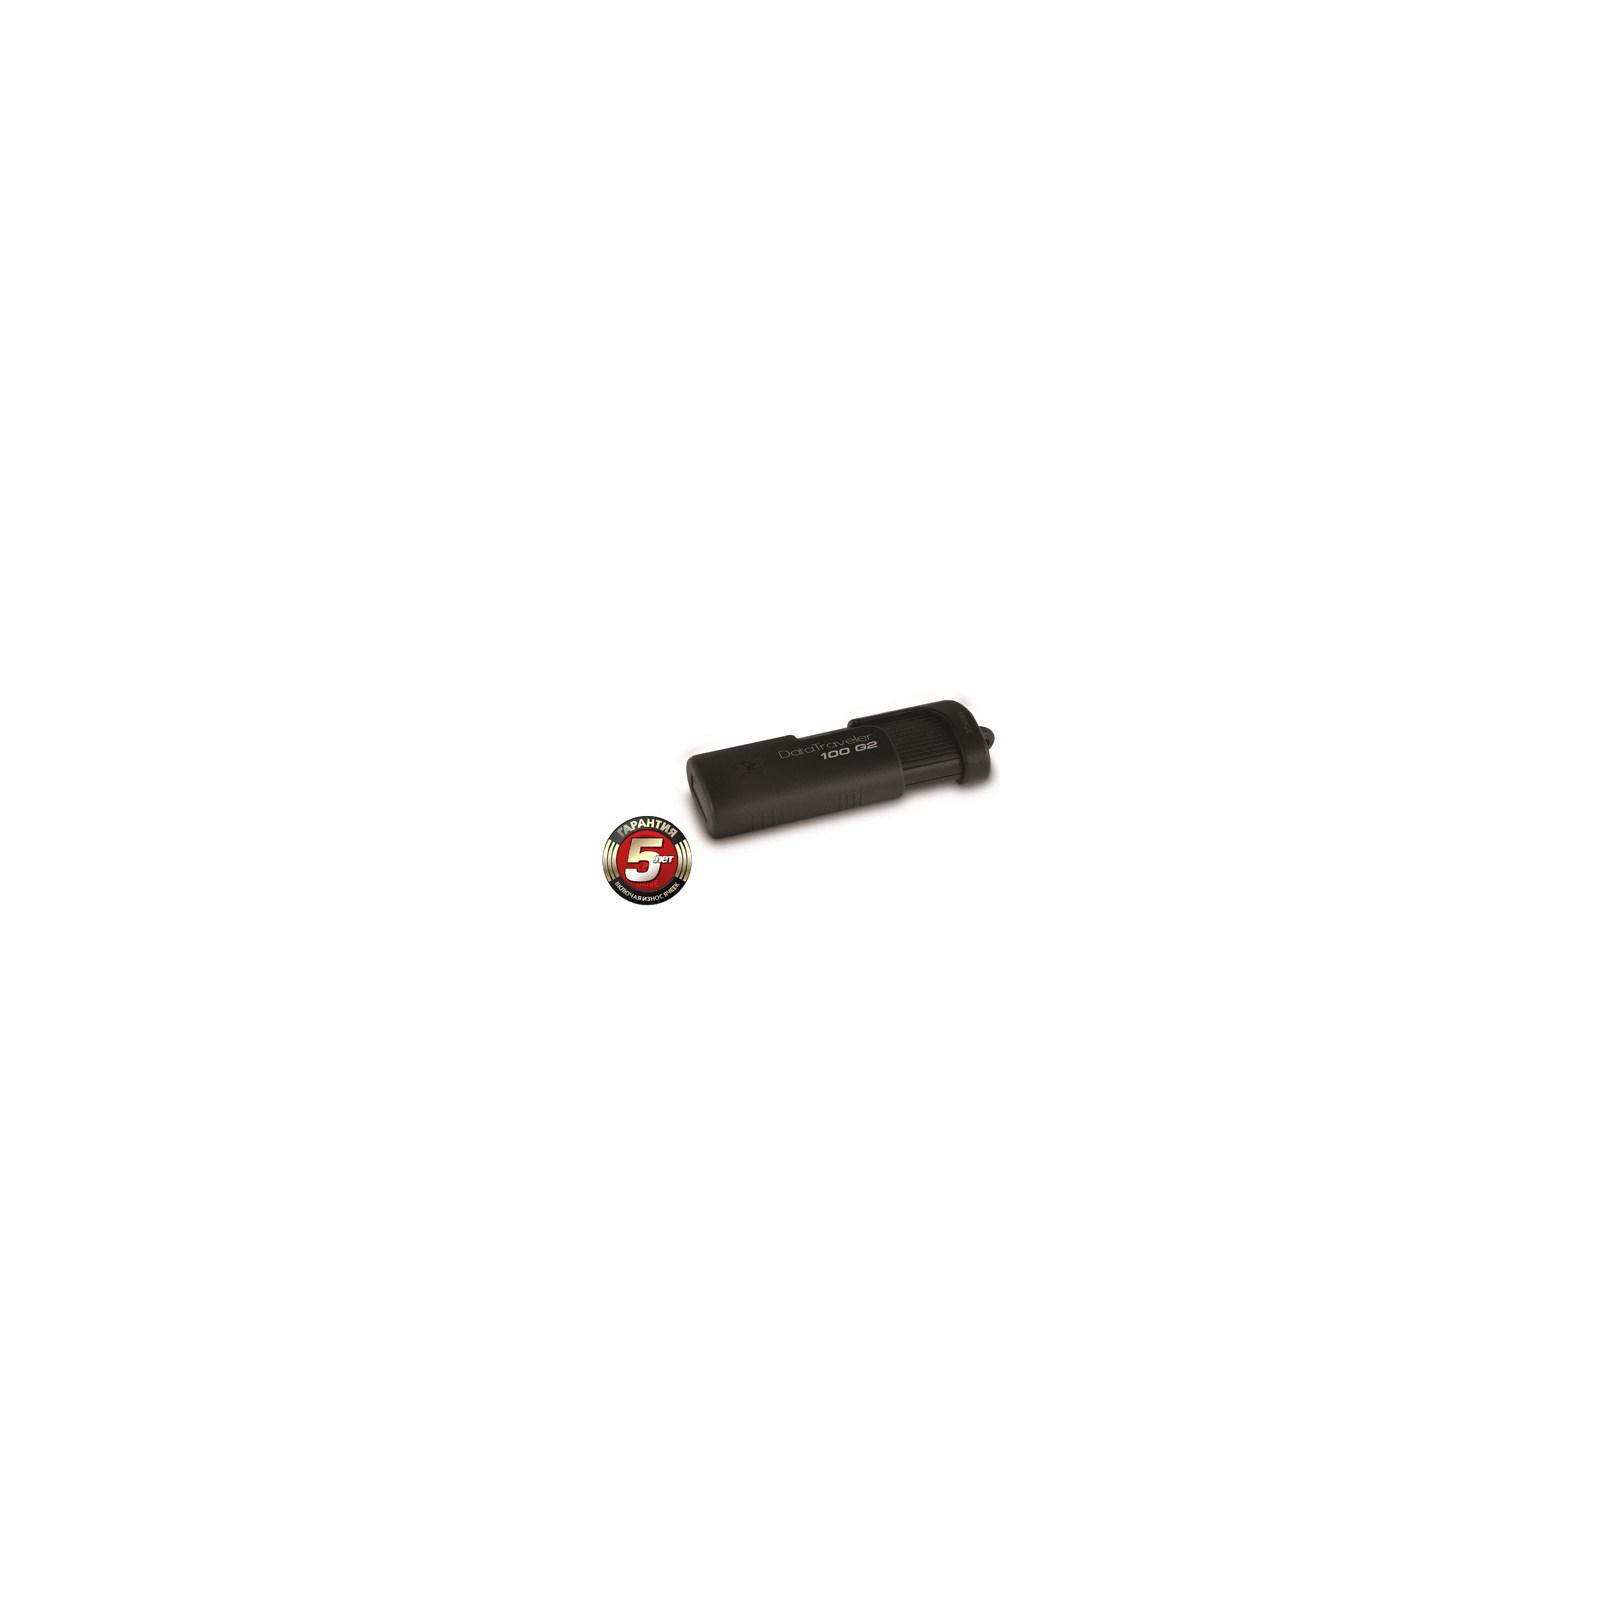 USB флеш накопитель 16Gb DataTraveler 100 Generation 2 Kingston (DT100G2/16GBZ / DT100G2/16GBZ)